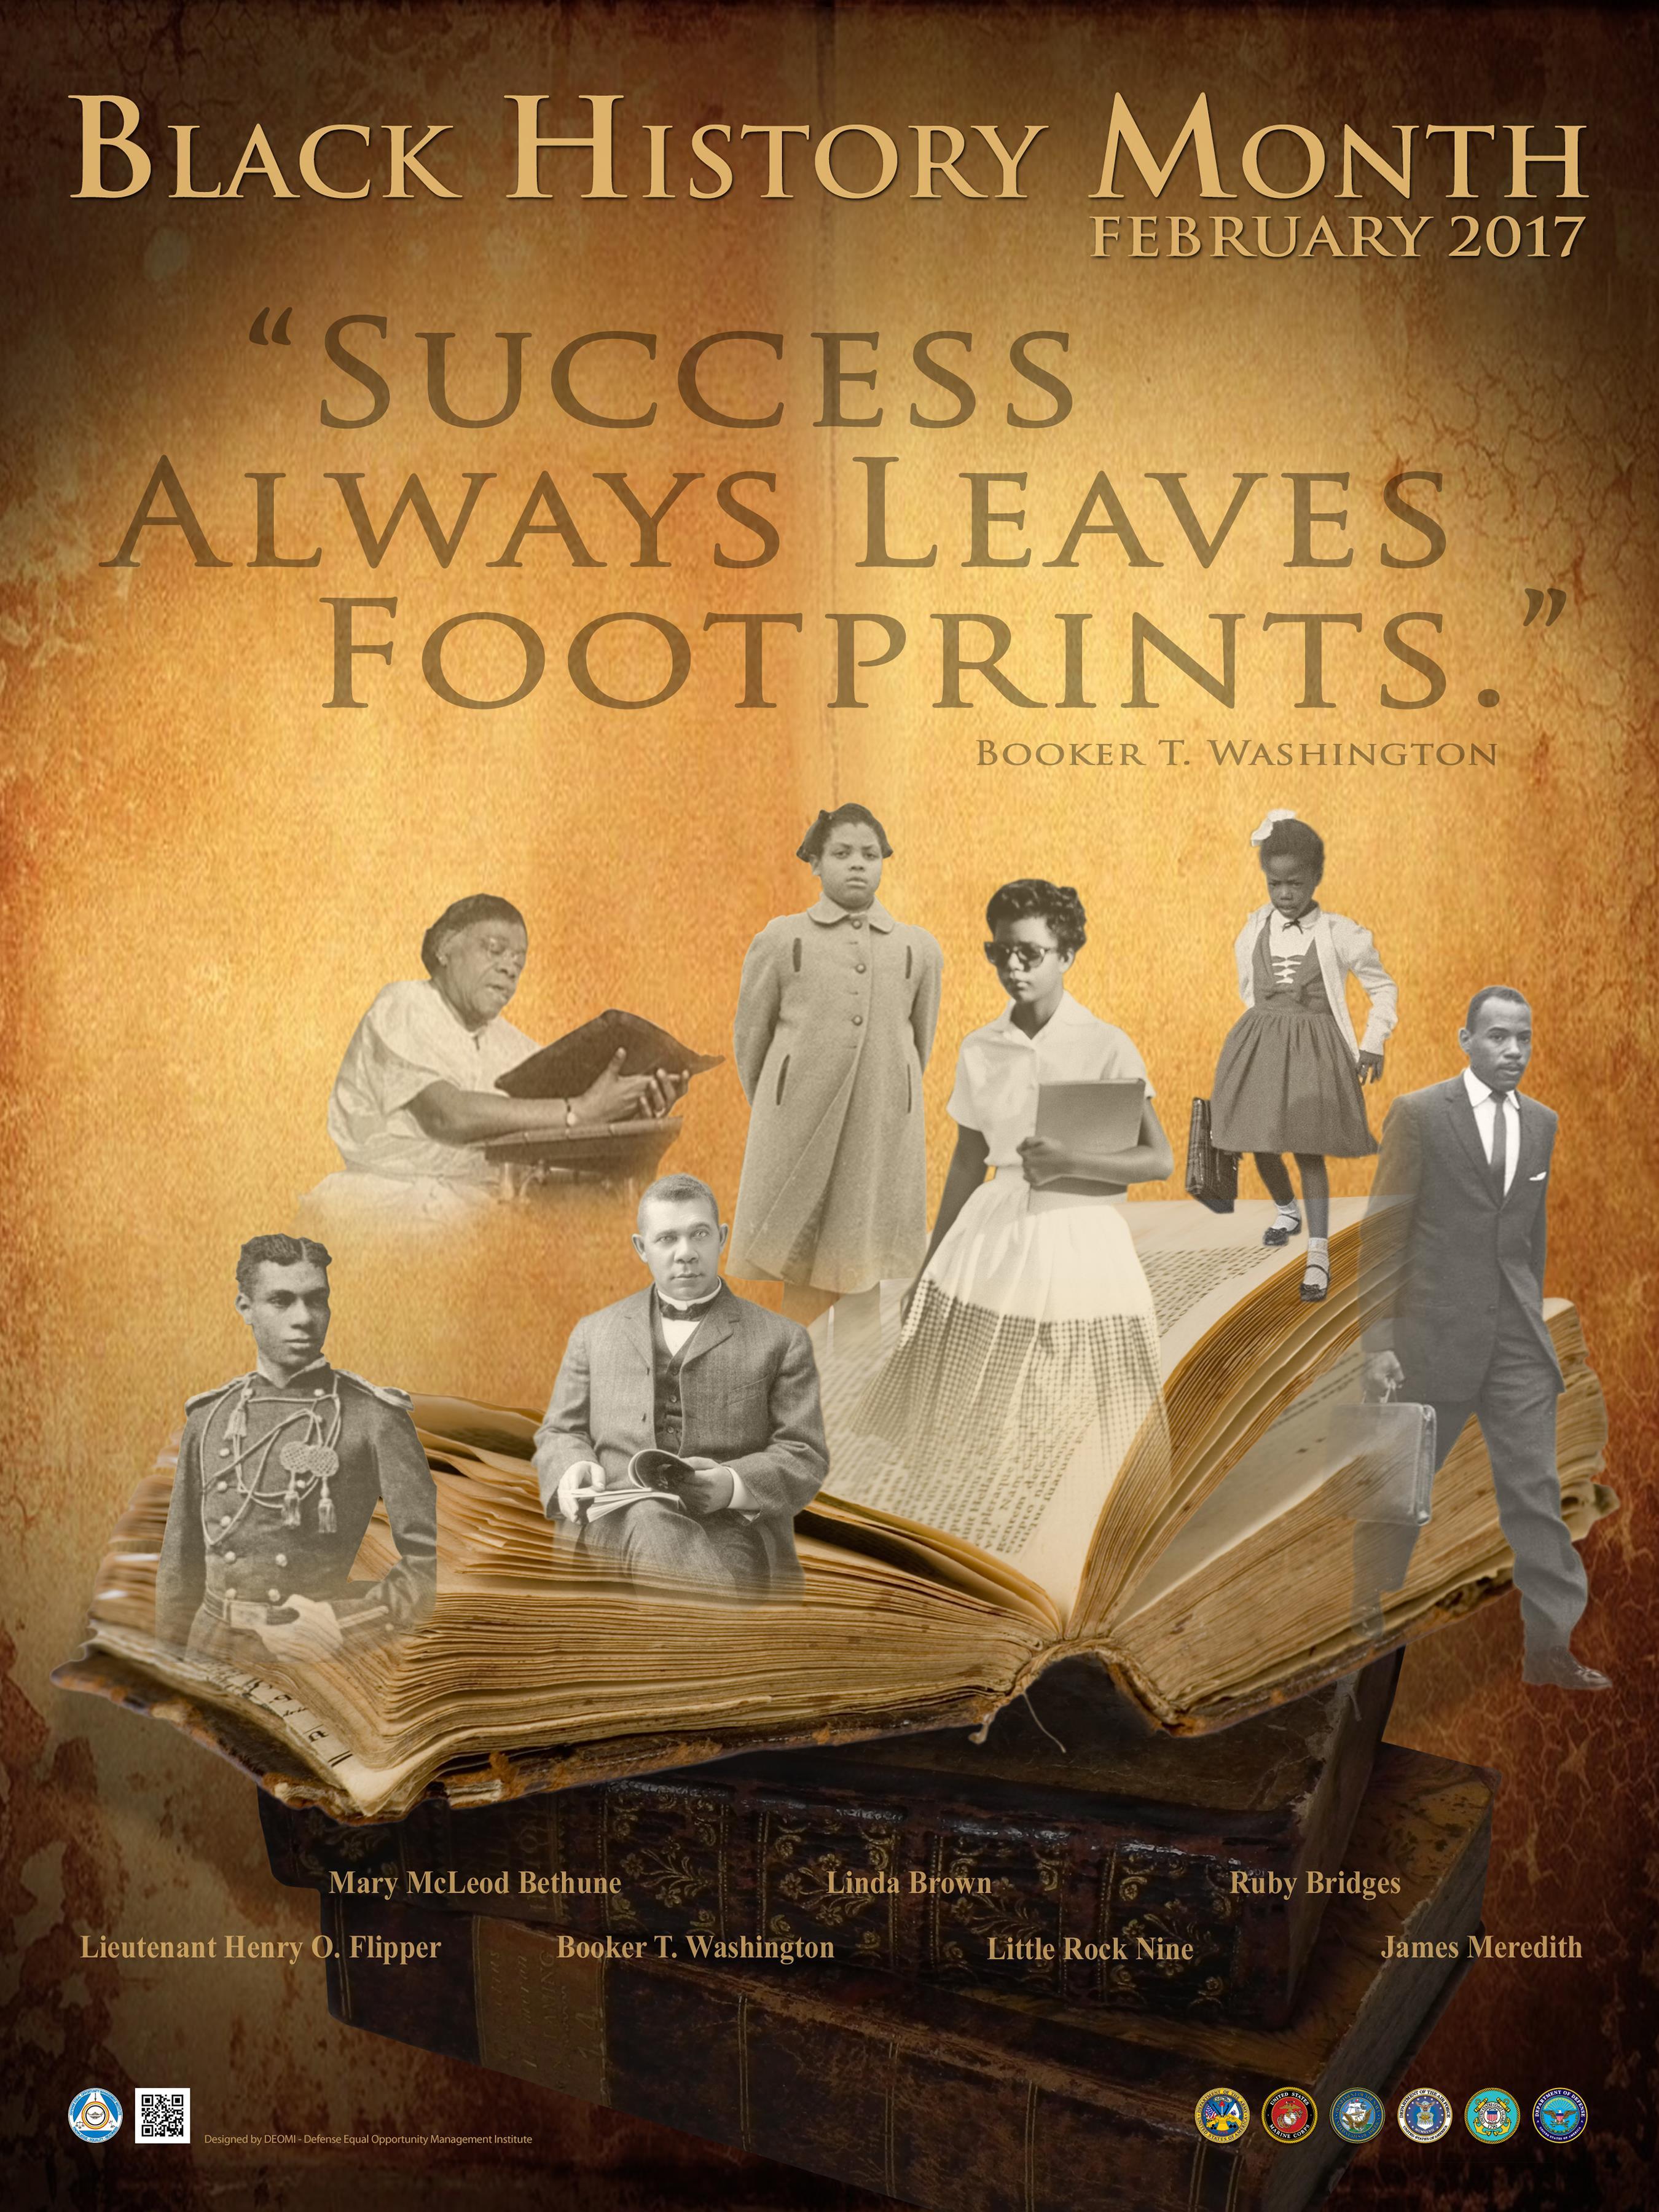 Black History In America On Pinterest: Celebrating Black History Month, Booker T. Washington